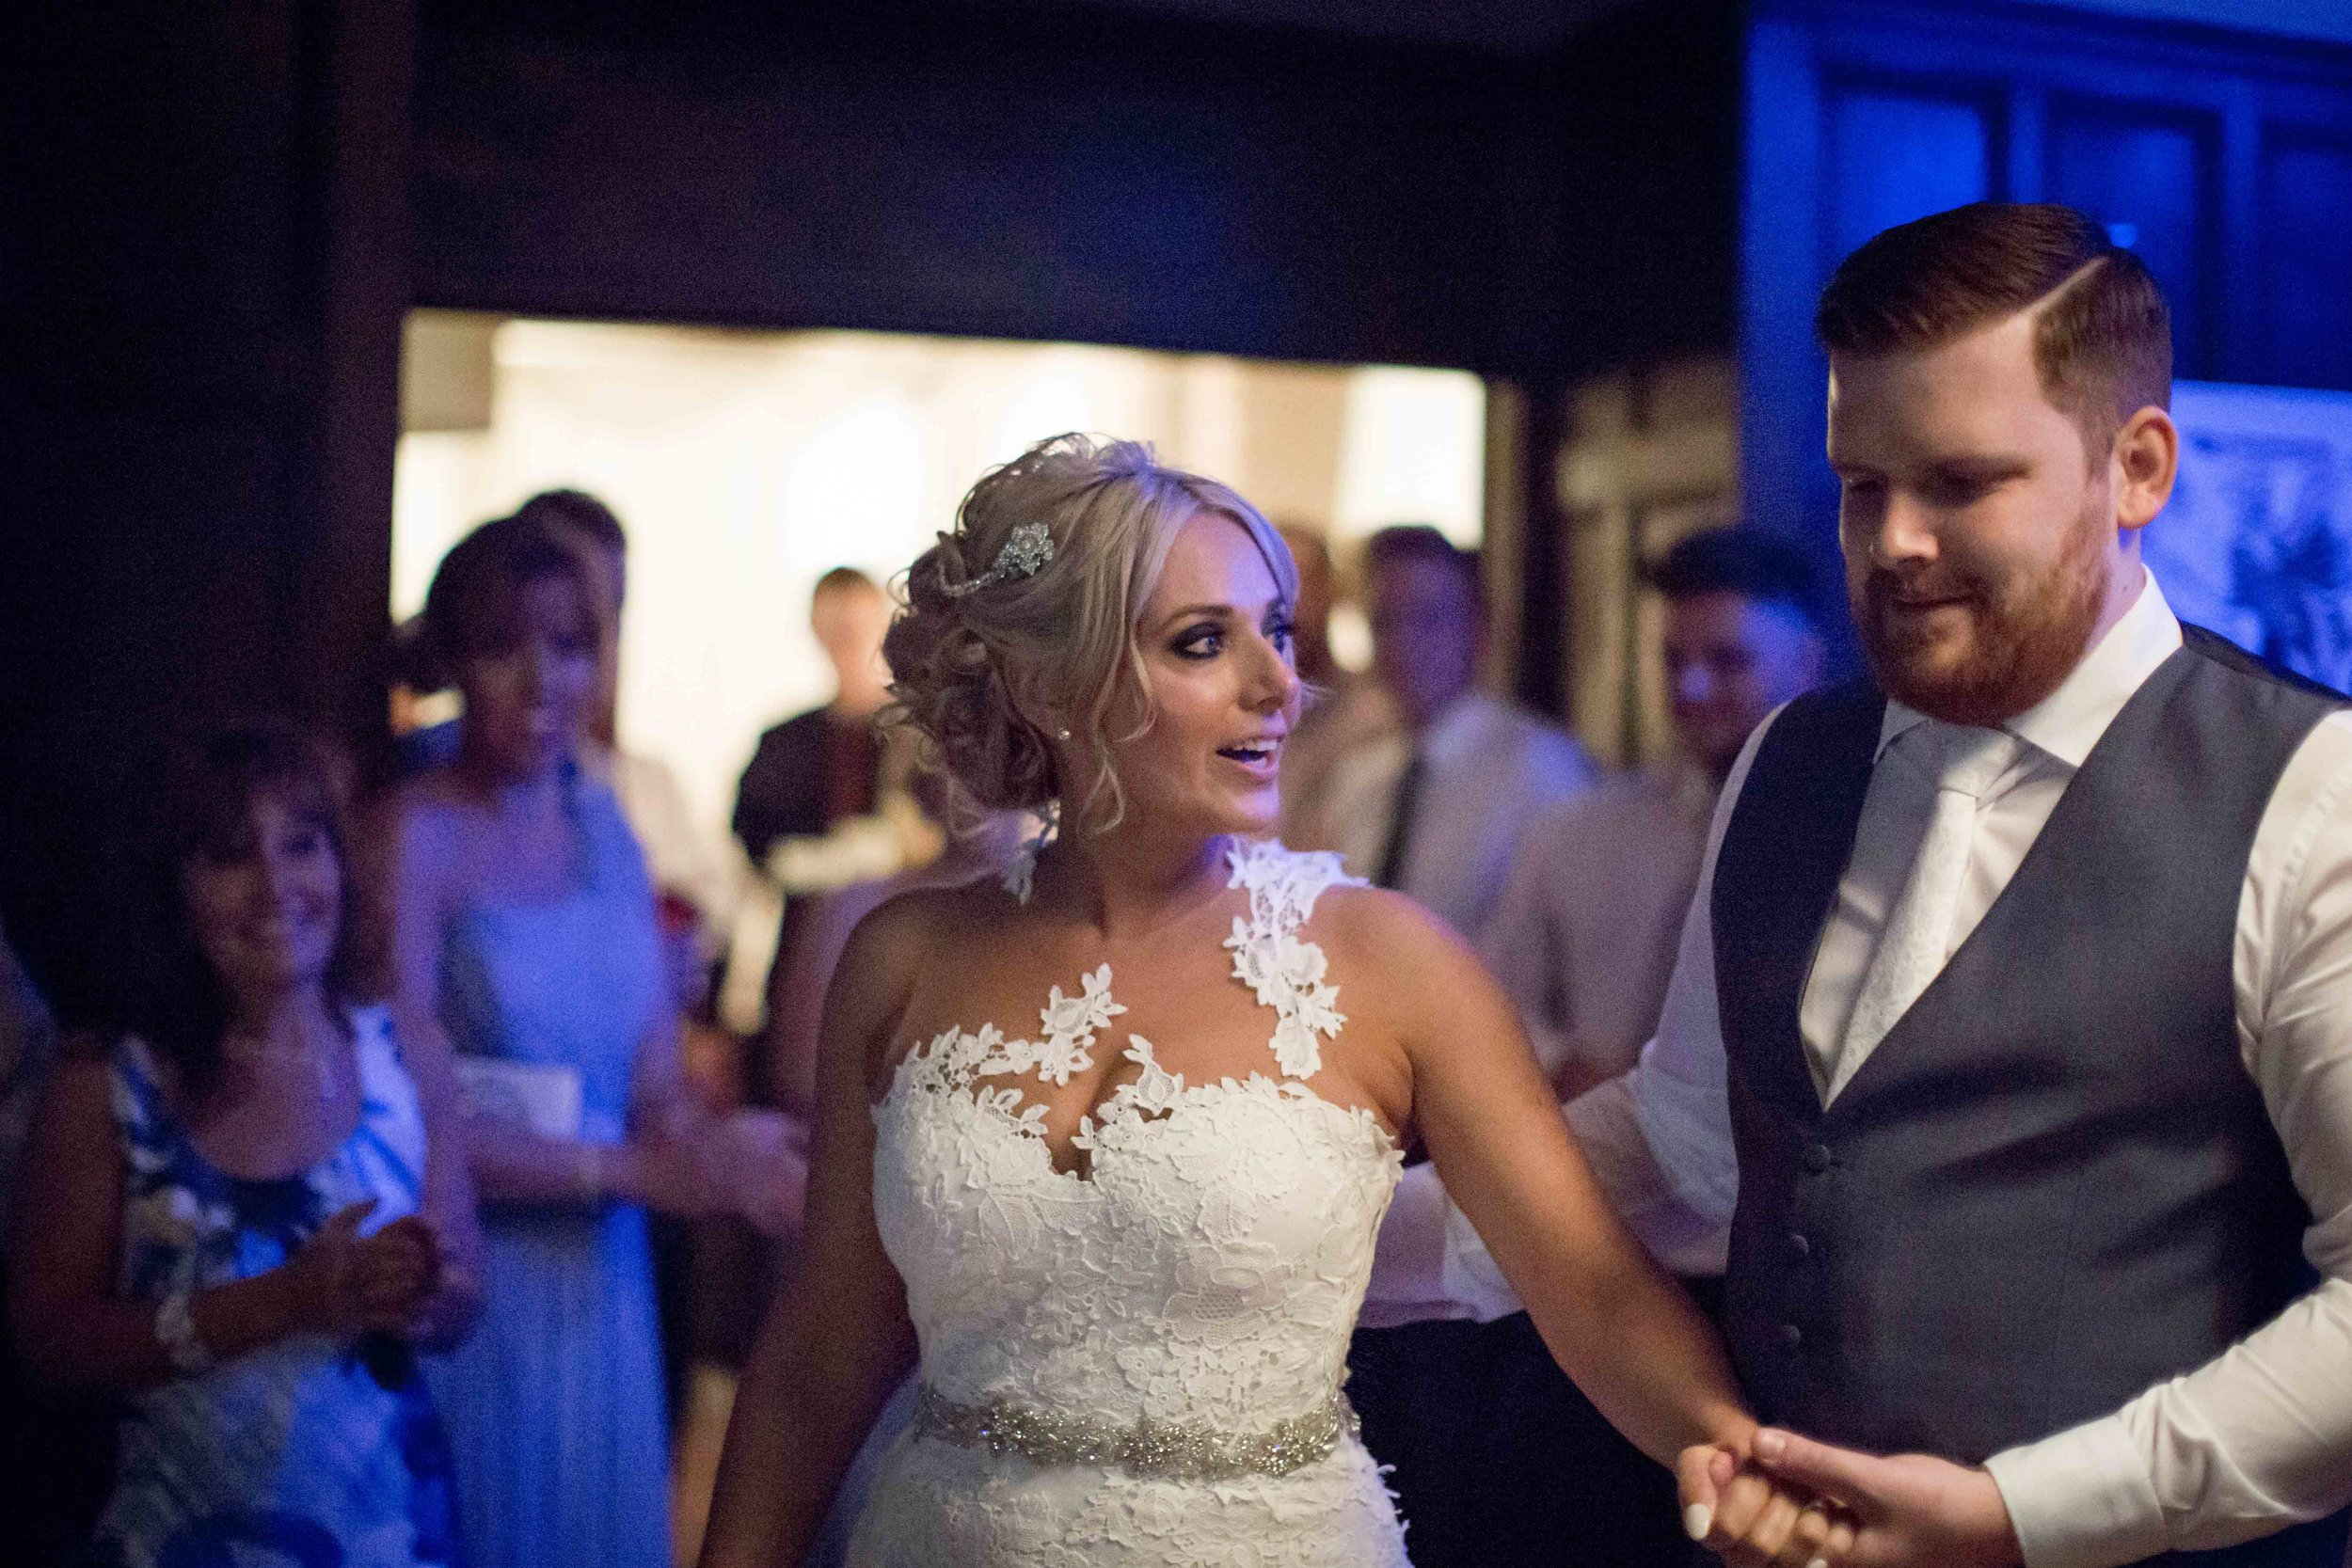 cotswold-wedding-photography-at-stonehouse-court-hotel-natalia-smith-photography-gloucestershire-wedding-photographer-88.jpg